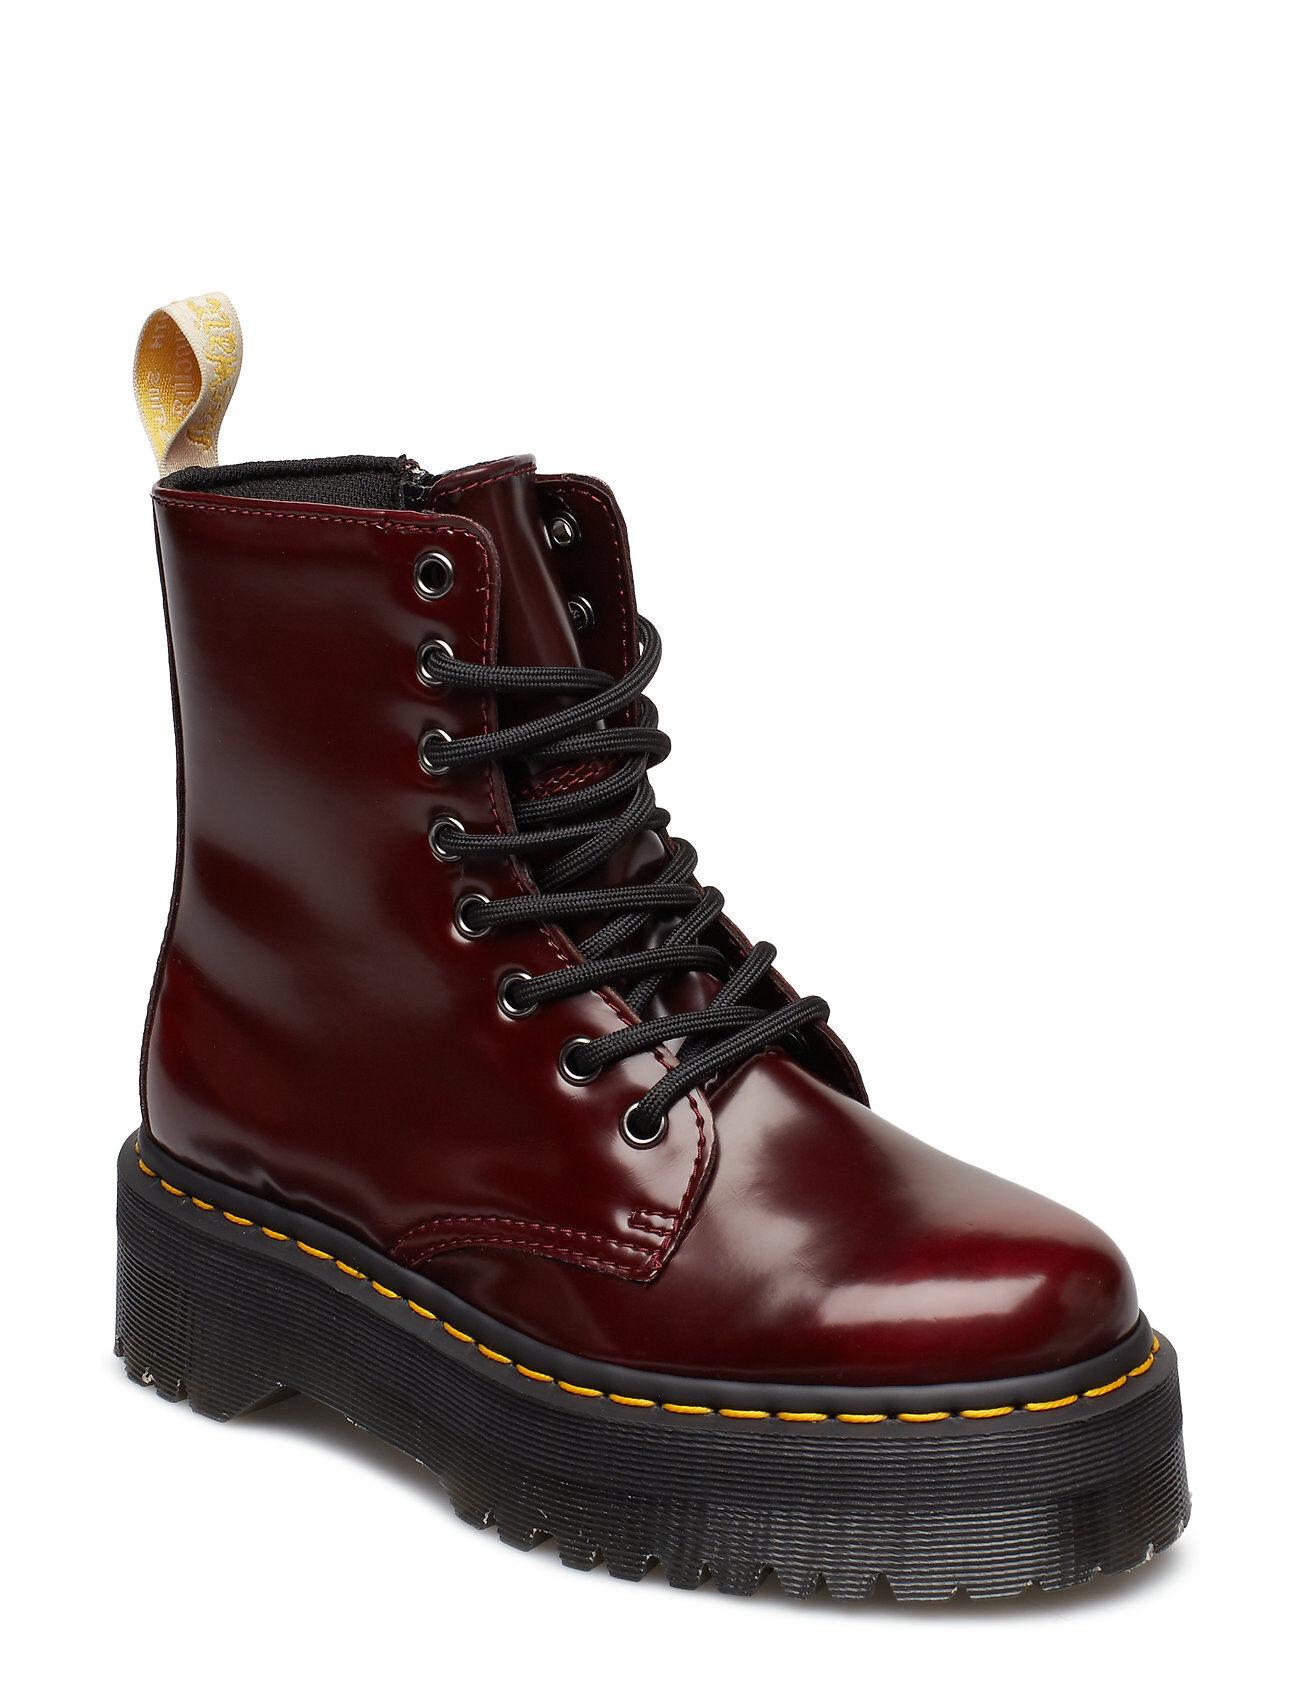 Image of Dr. Martens Jadon Shoes Boots Ankle Boots Ankle Boots Flat Heel Punainen Dr. Martens